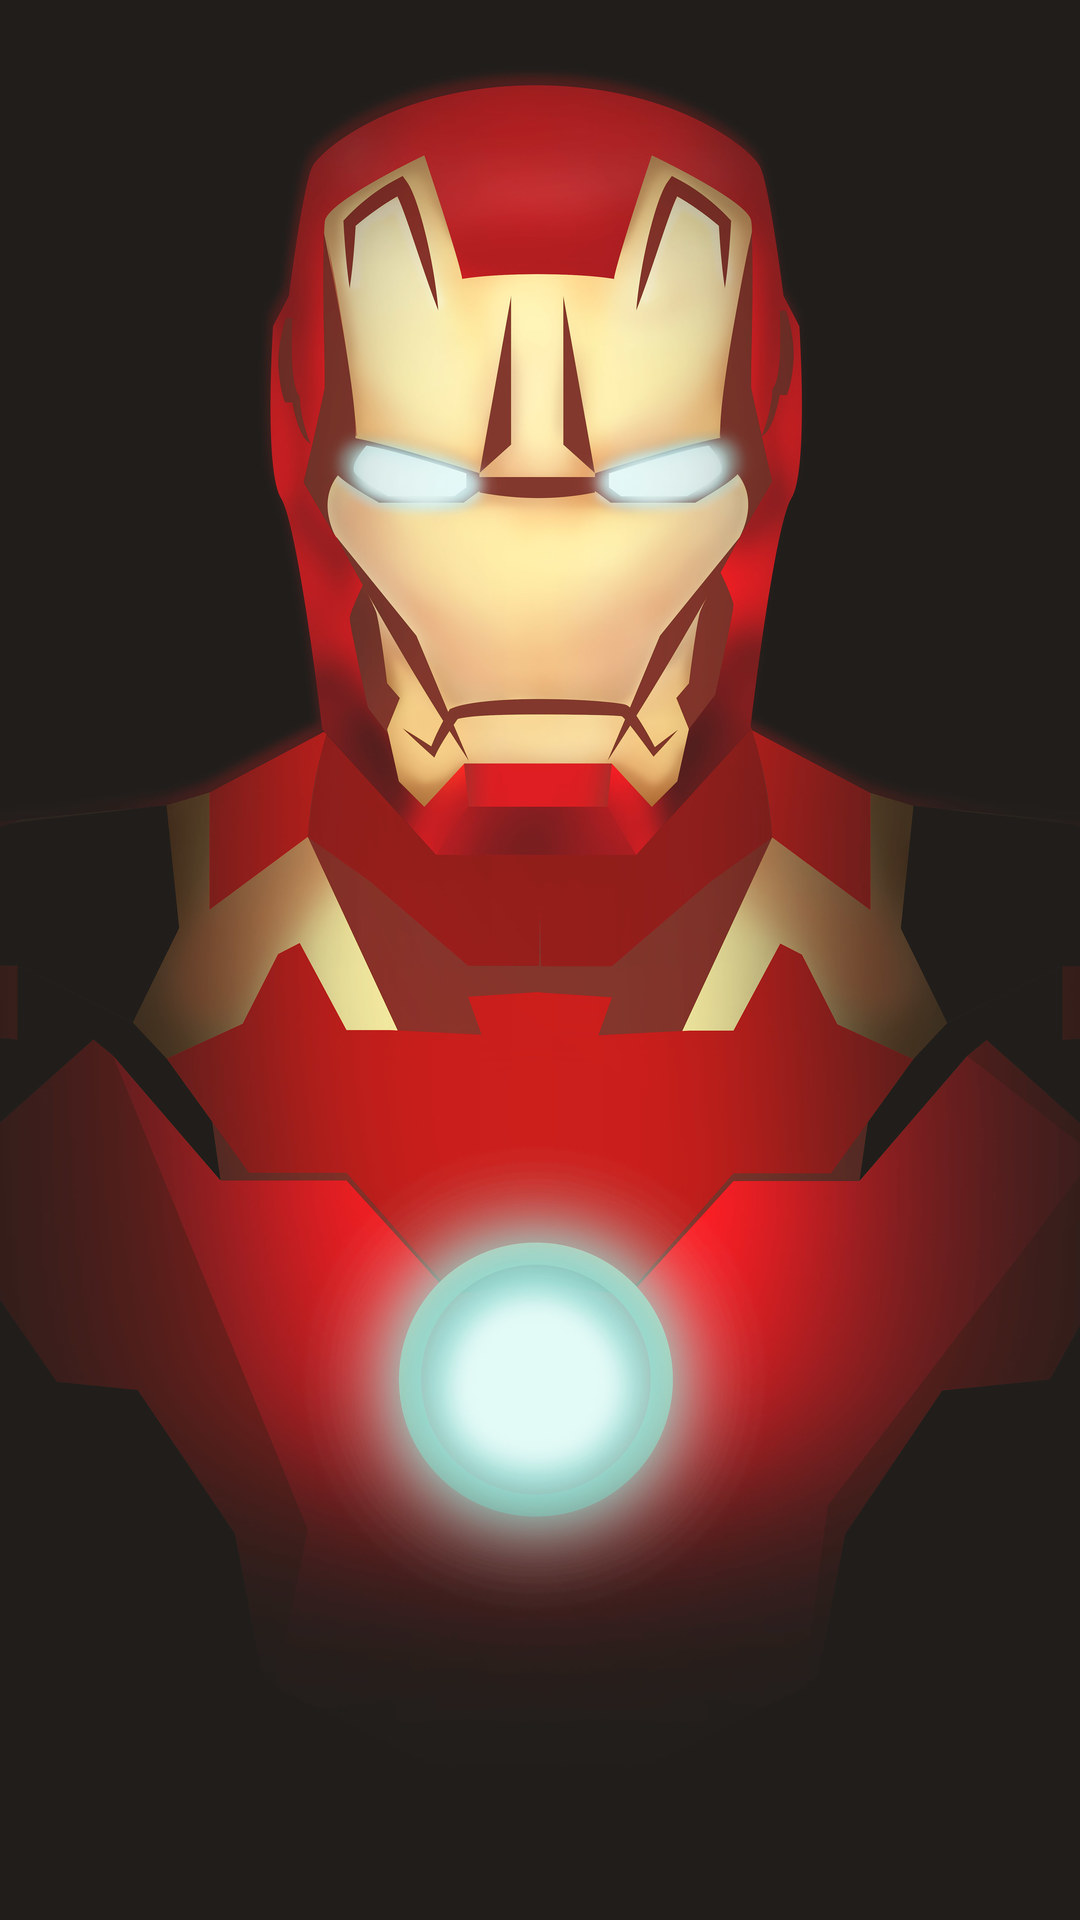 Iron Man Mark 43 Minimal iPhone Wallpaper